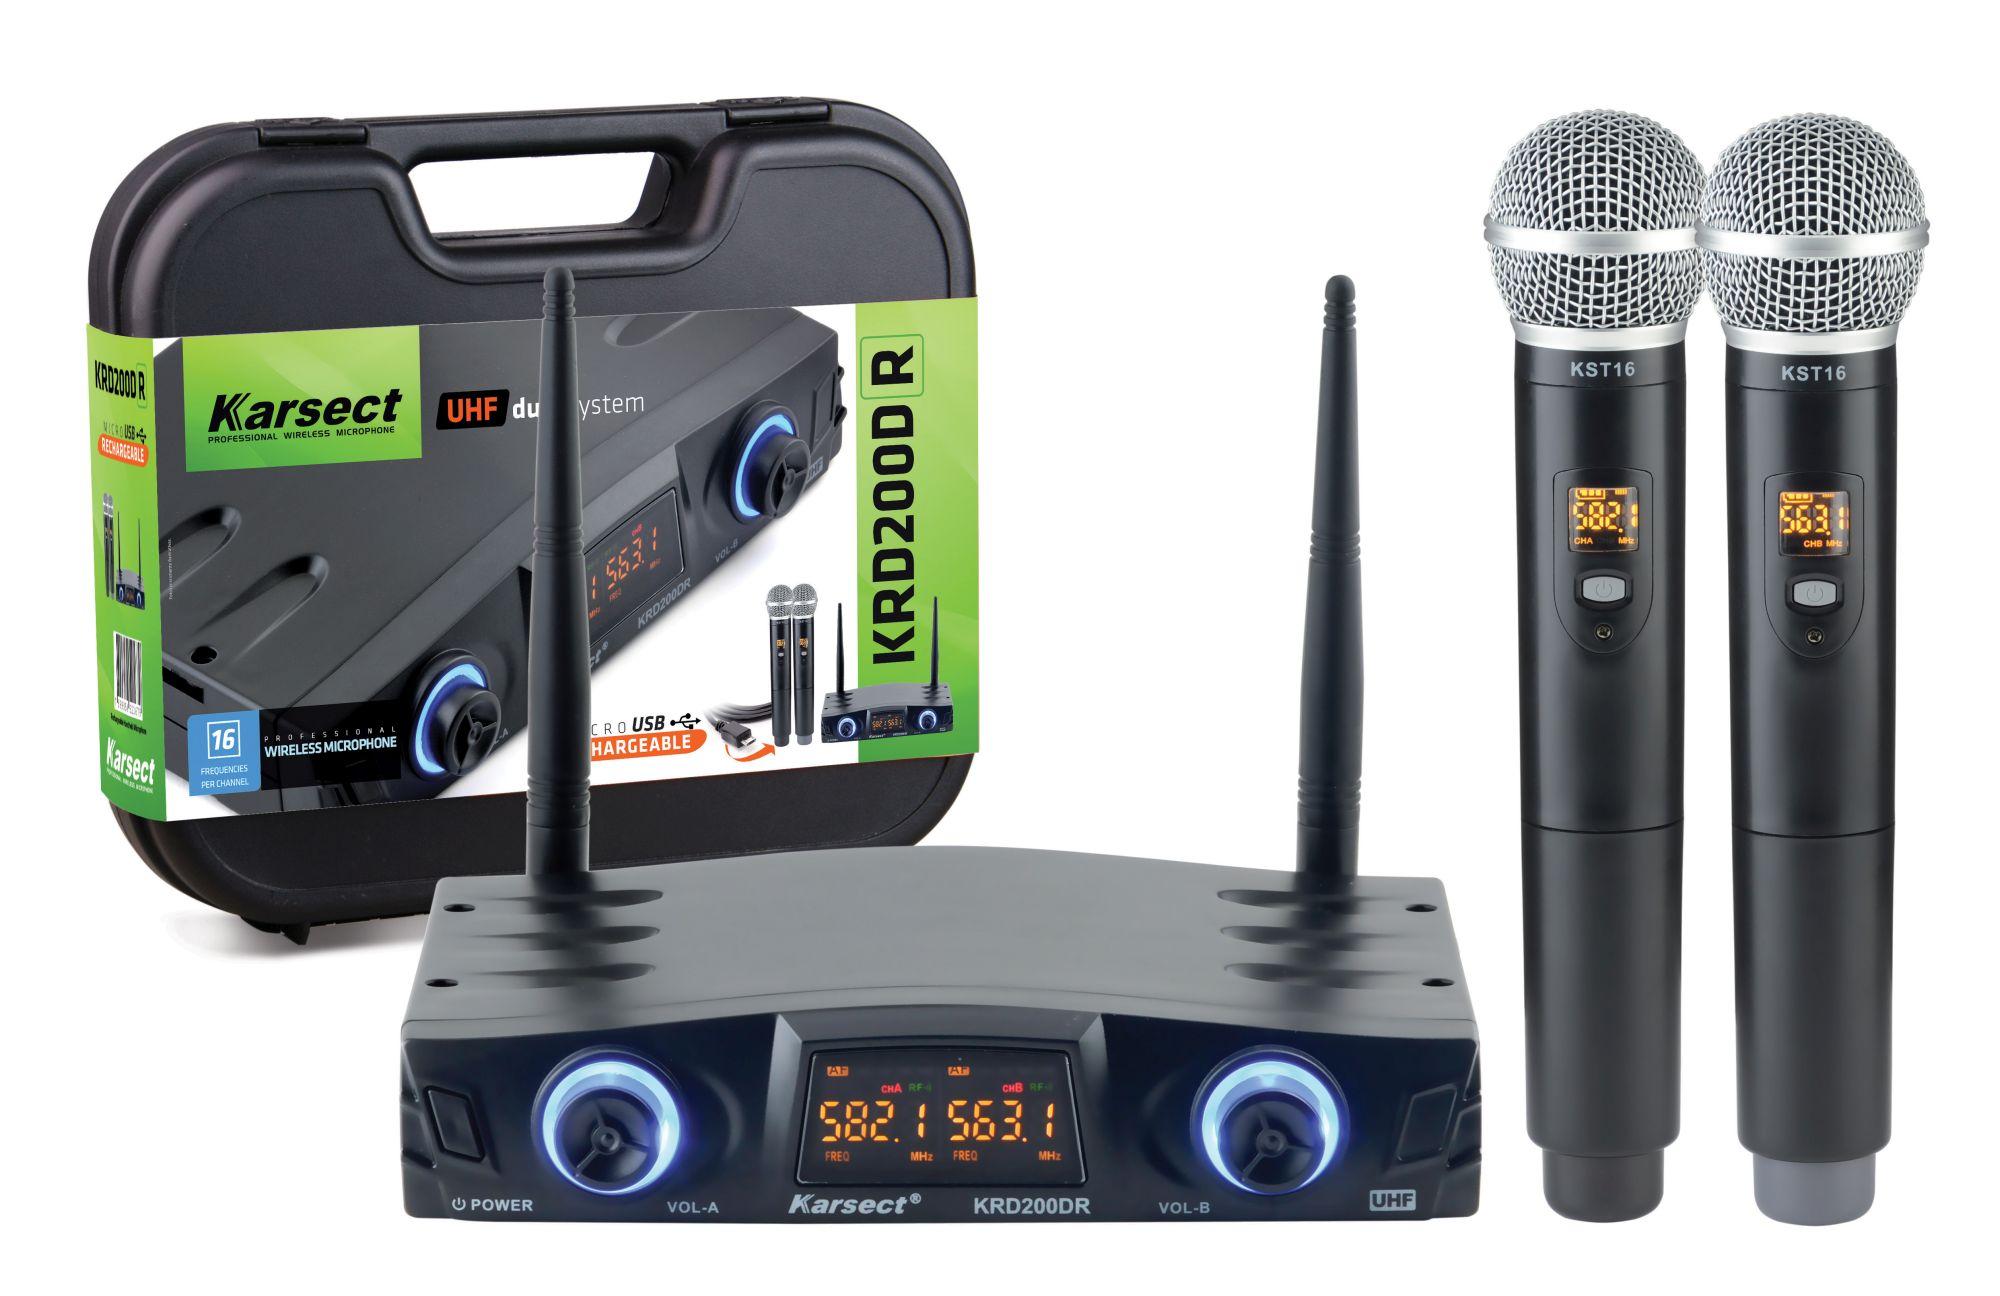 Microfone Karsect S/fio Krd200dr Duplo Mao Recarregavel